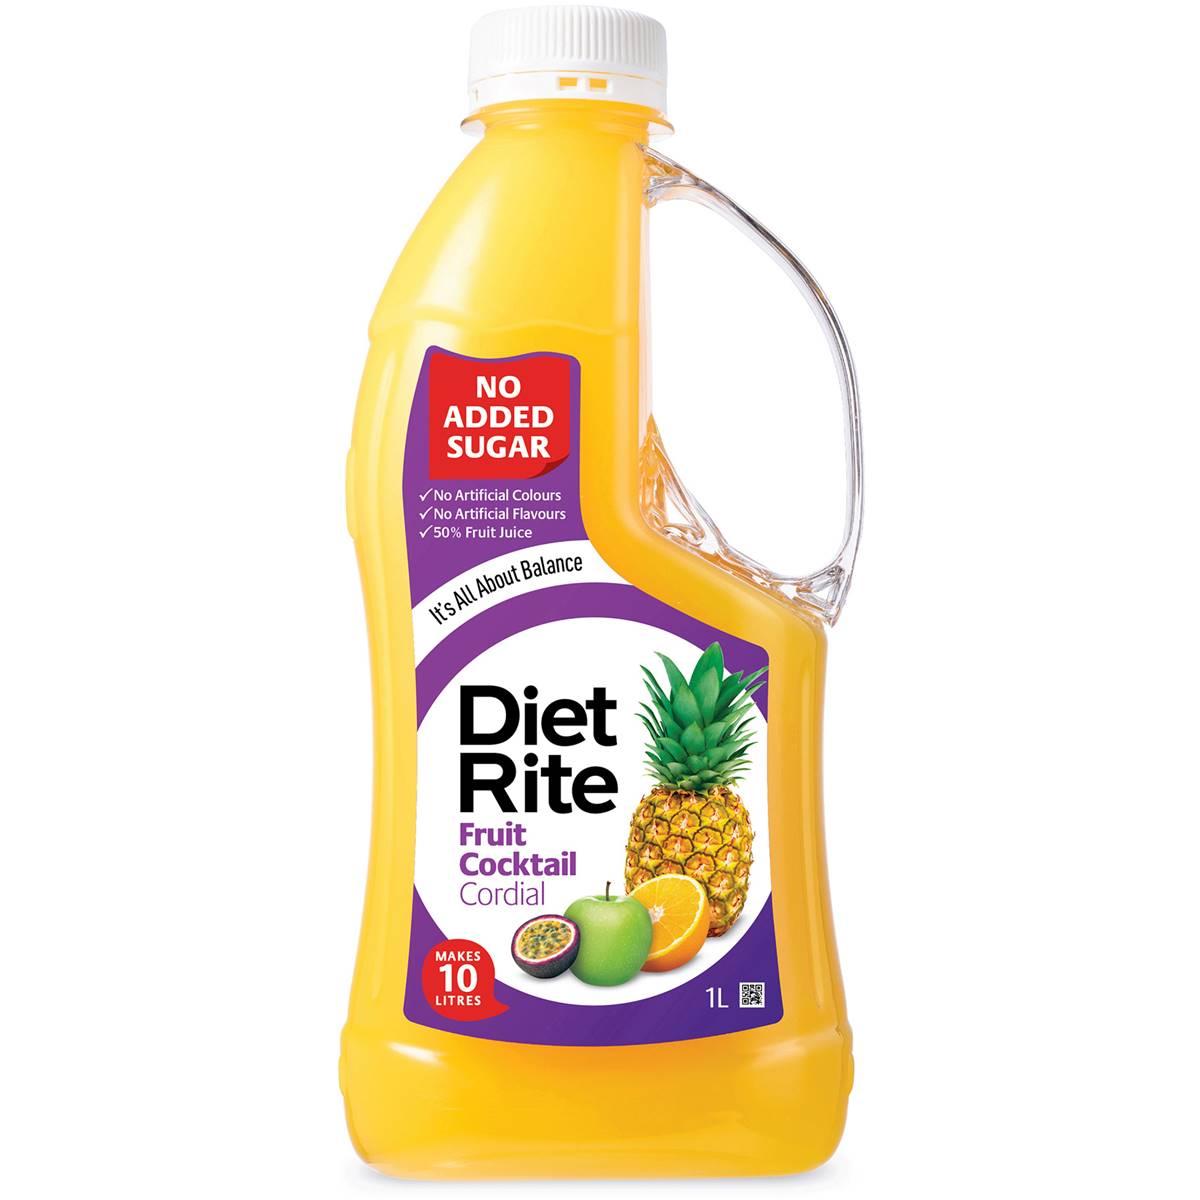 Diet Rite Cordial Fruit Cocktail